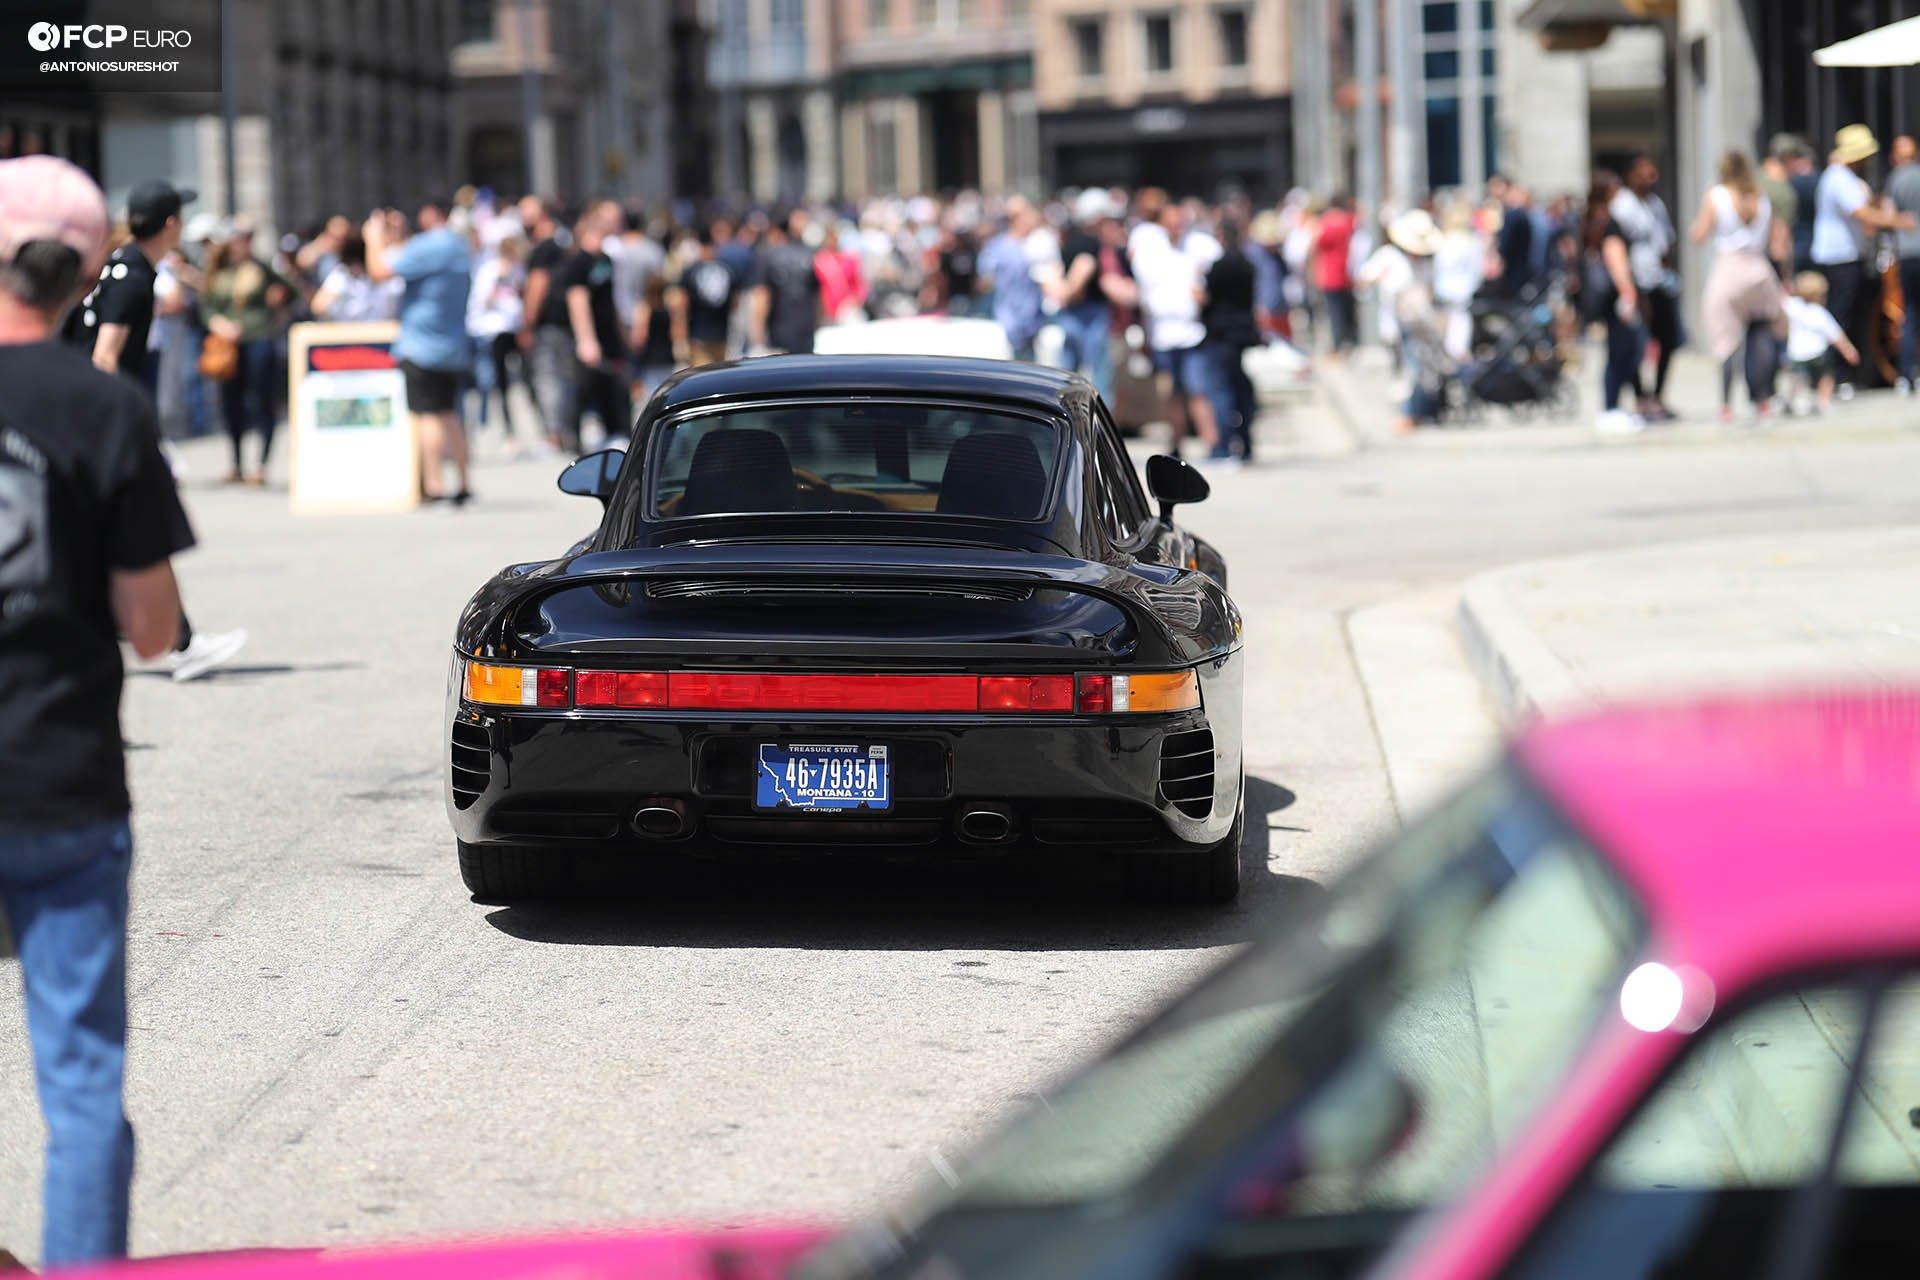 Luftgekühlt Air Cooled Porsche Universal Pictures Back Lot Porsche 959